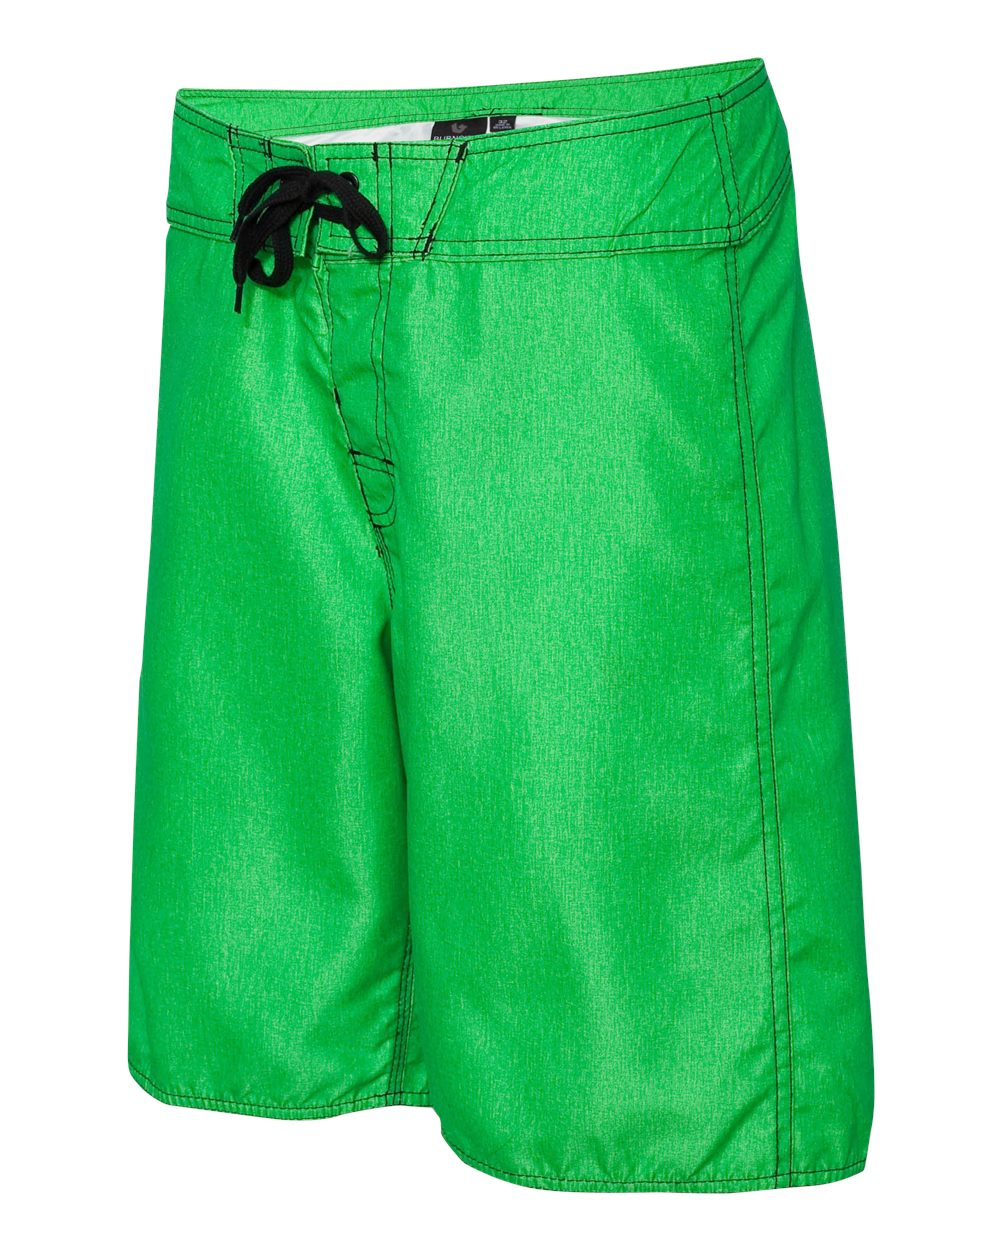 Burnside-Men-039-s-Heathered-Board-Shorts-B9305-30-40 thumbnail 9